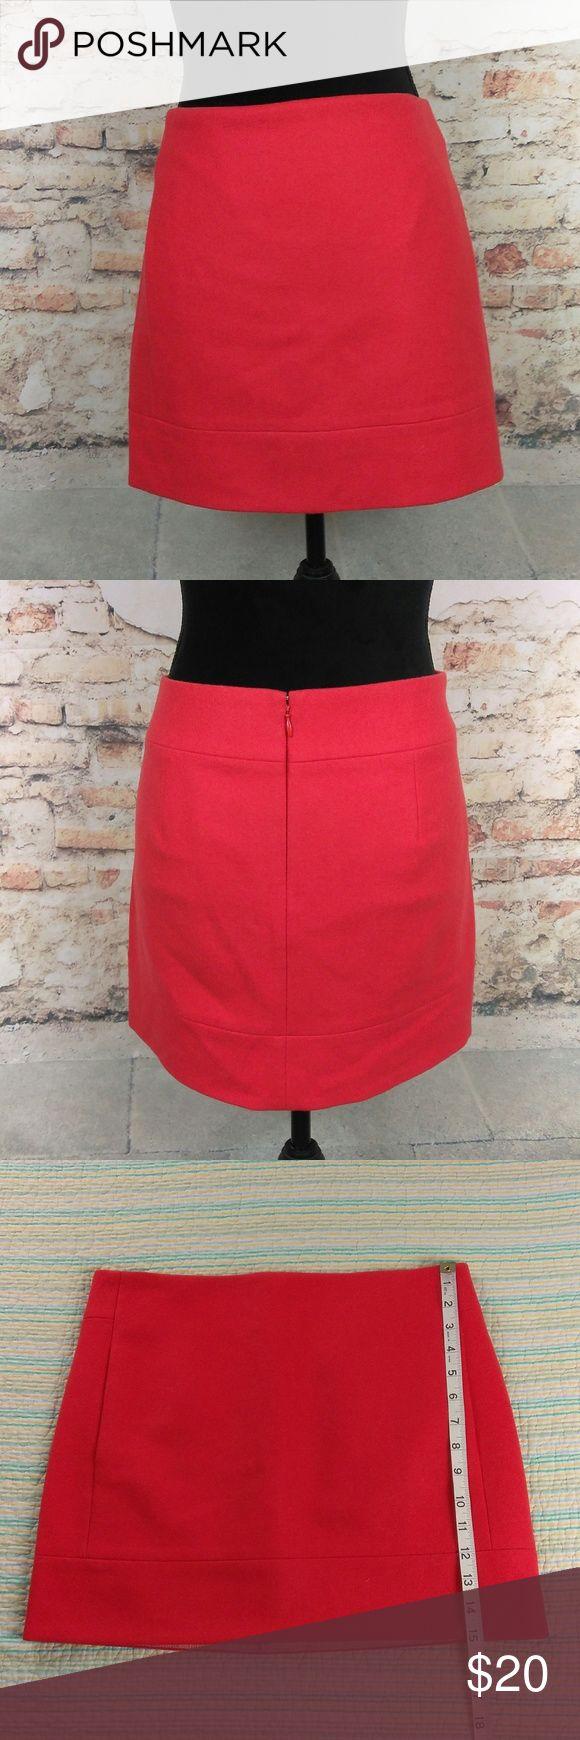 J. Crew 4 Red Orange Double Serge Wool Mini Skirt J. Crew Wms Sz 4 Red Orange Double Serge Wool Blend Mini Skirt Lined w/ POCKETS J. Crew Skirts Mini